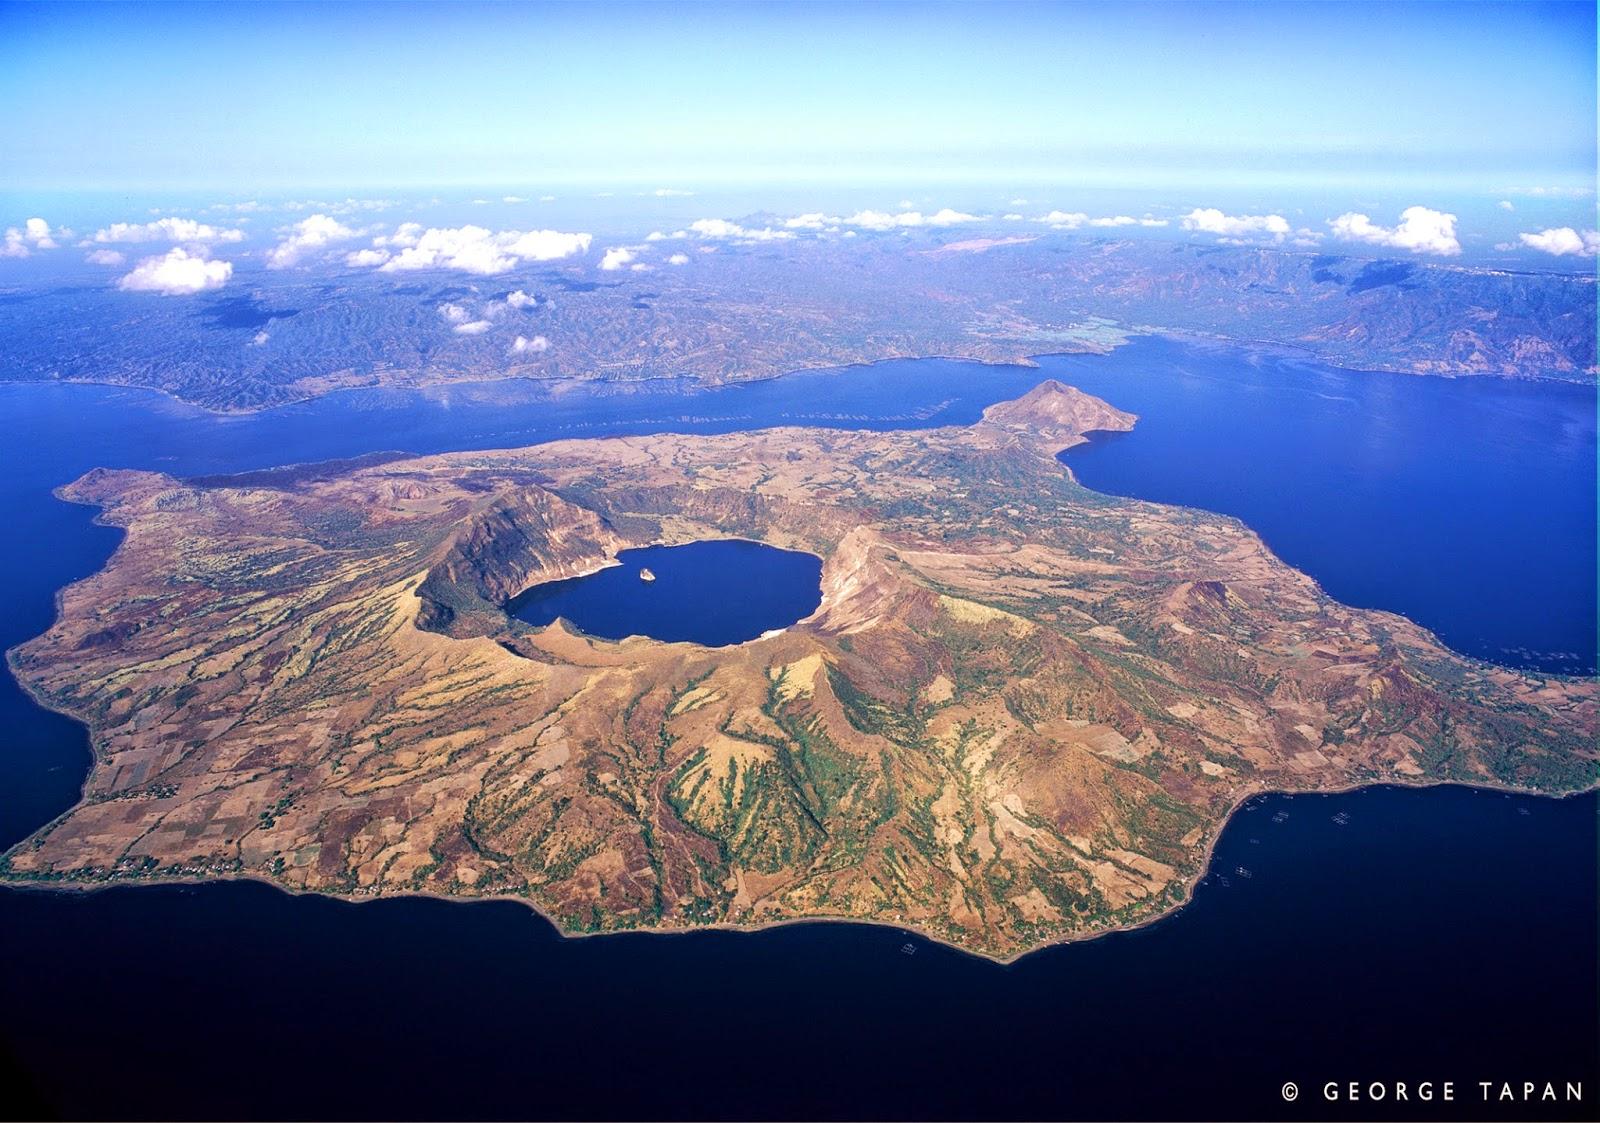 An Island within a Lake on an Island within a Lake on an Island